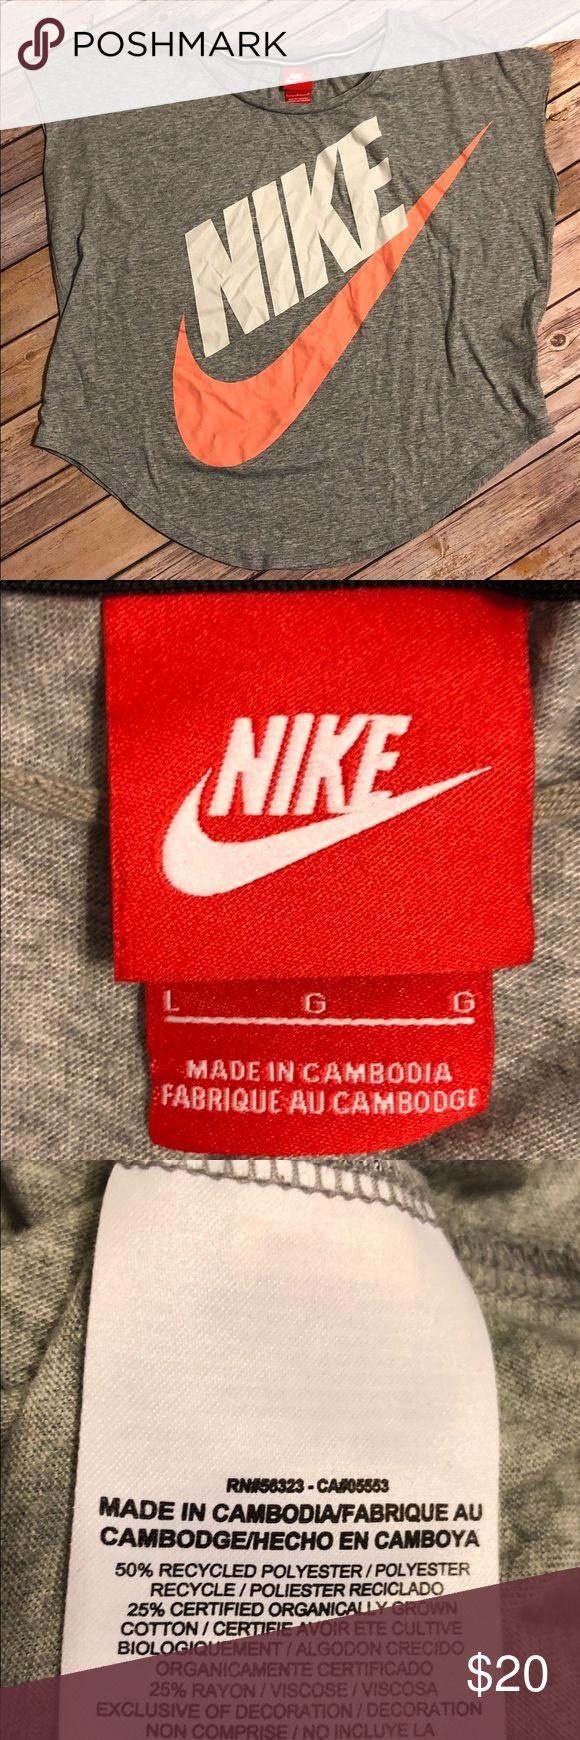 Cute😍 Nike top Comfy Nike short/sleeveless top. Size Lg Nike Tops Tees - Short Sleeve